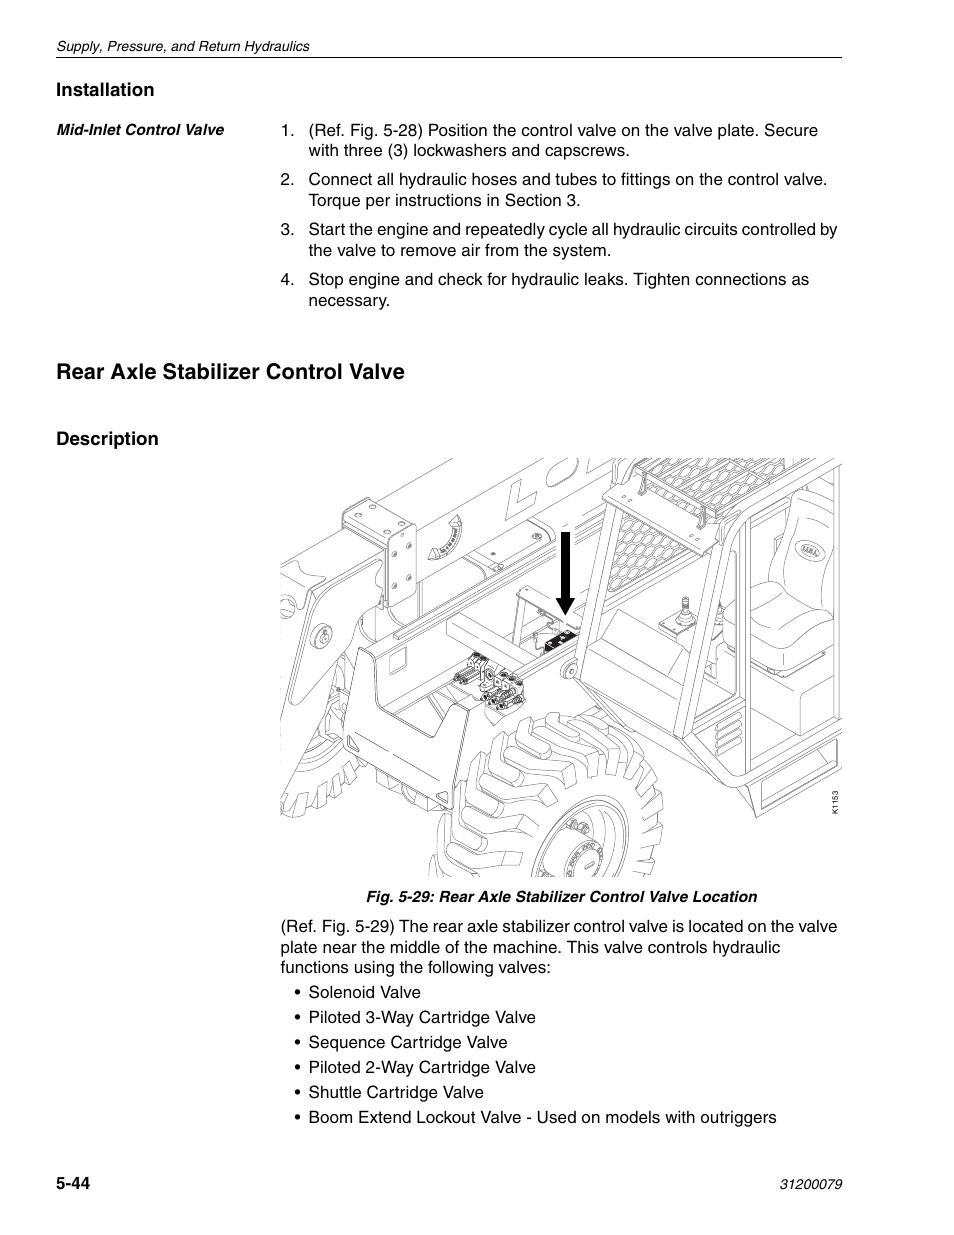 Rear Axle Stabilizer Control Valve  Installation